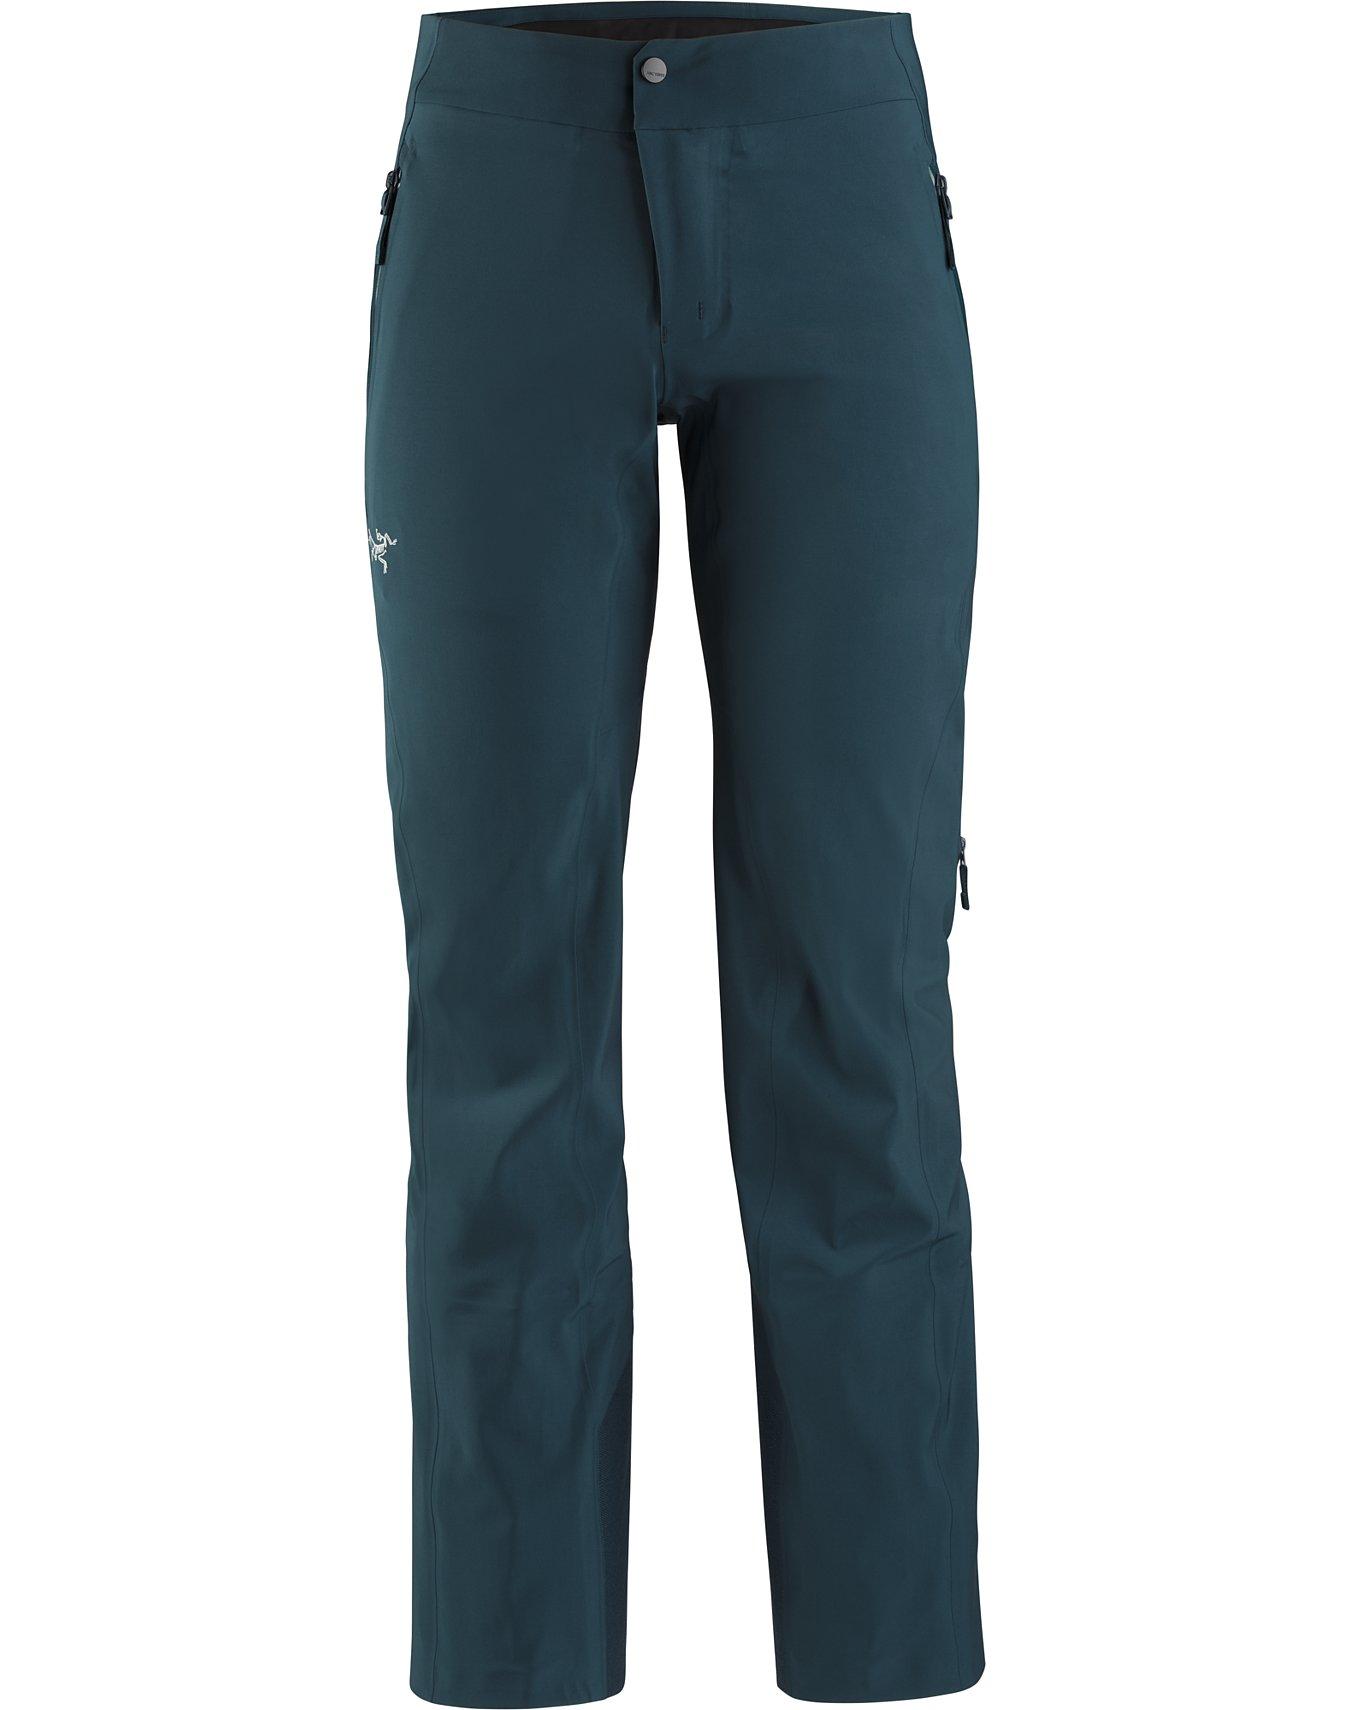 Xswsy XG Mens Athletics Multi Pocket Cargo Pant Elastic Waist Trousers Pants